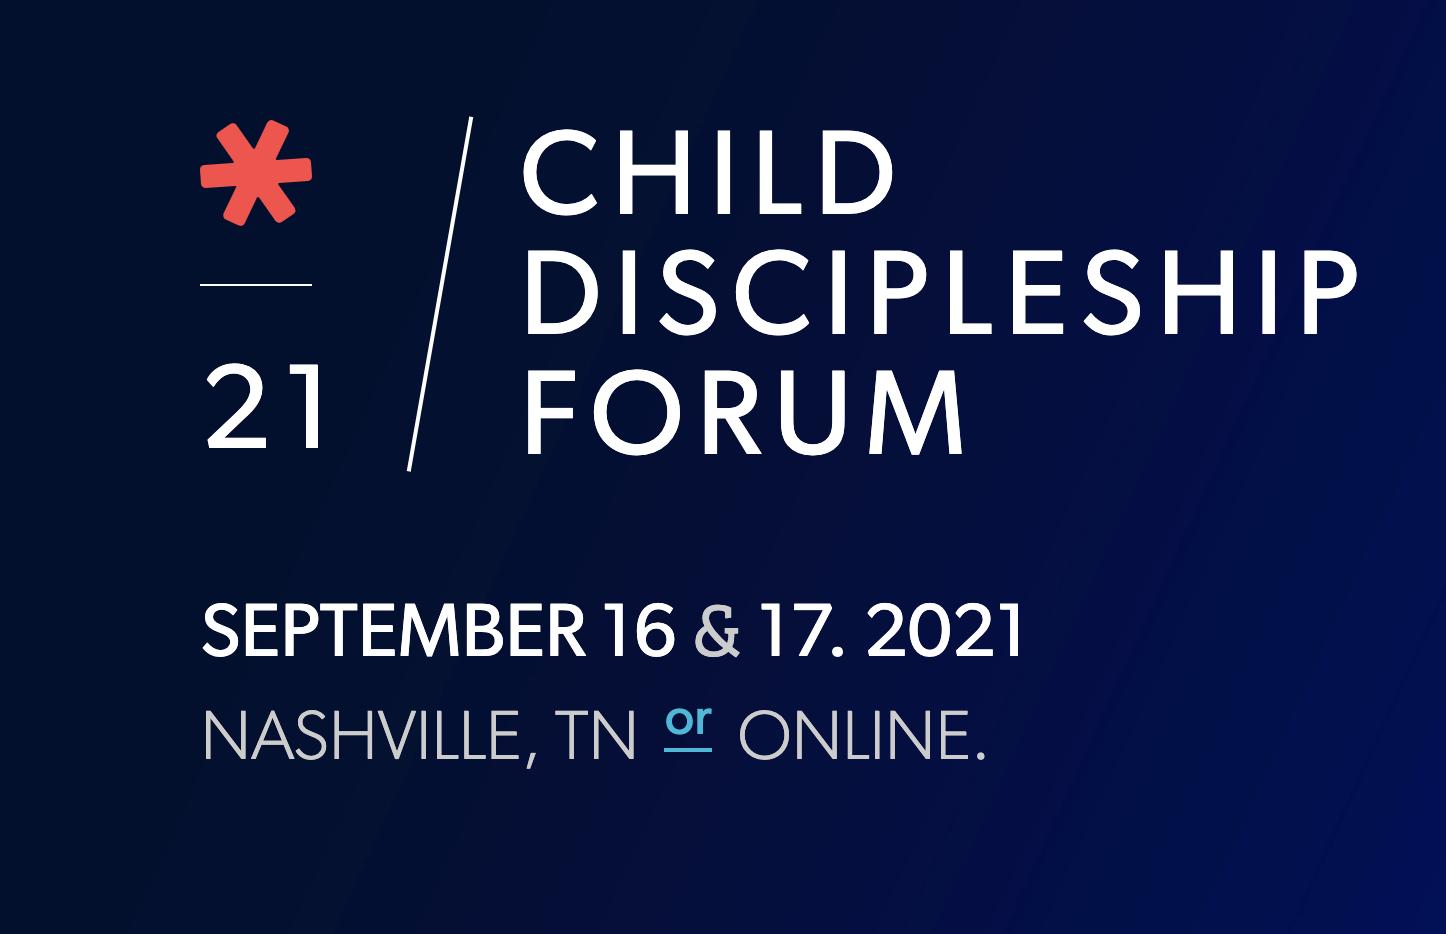 AWANA'S Child Discipleship Forum to Convene in Nashville this Fall